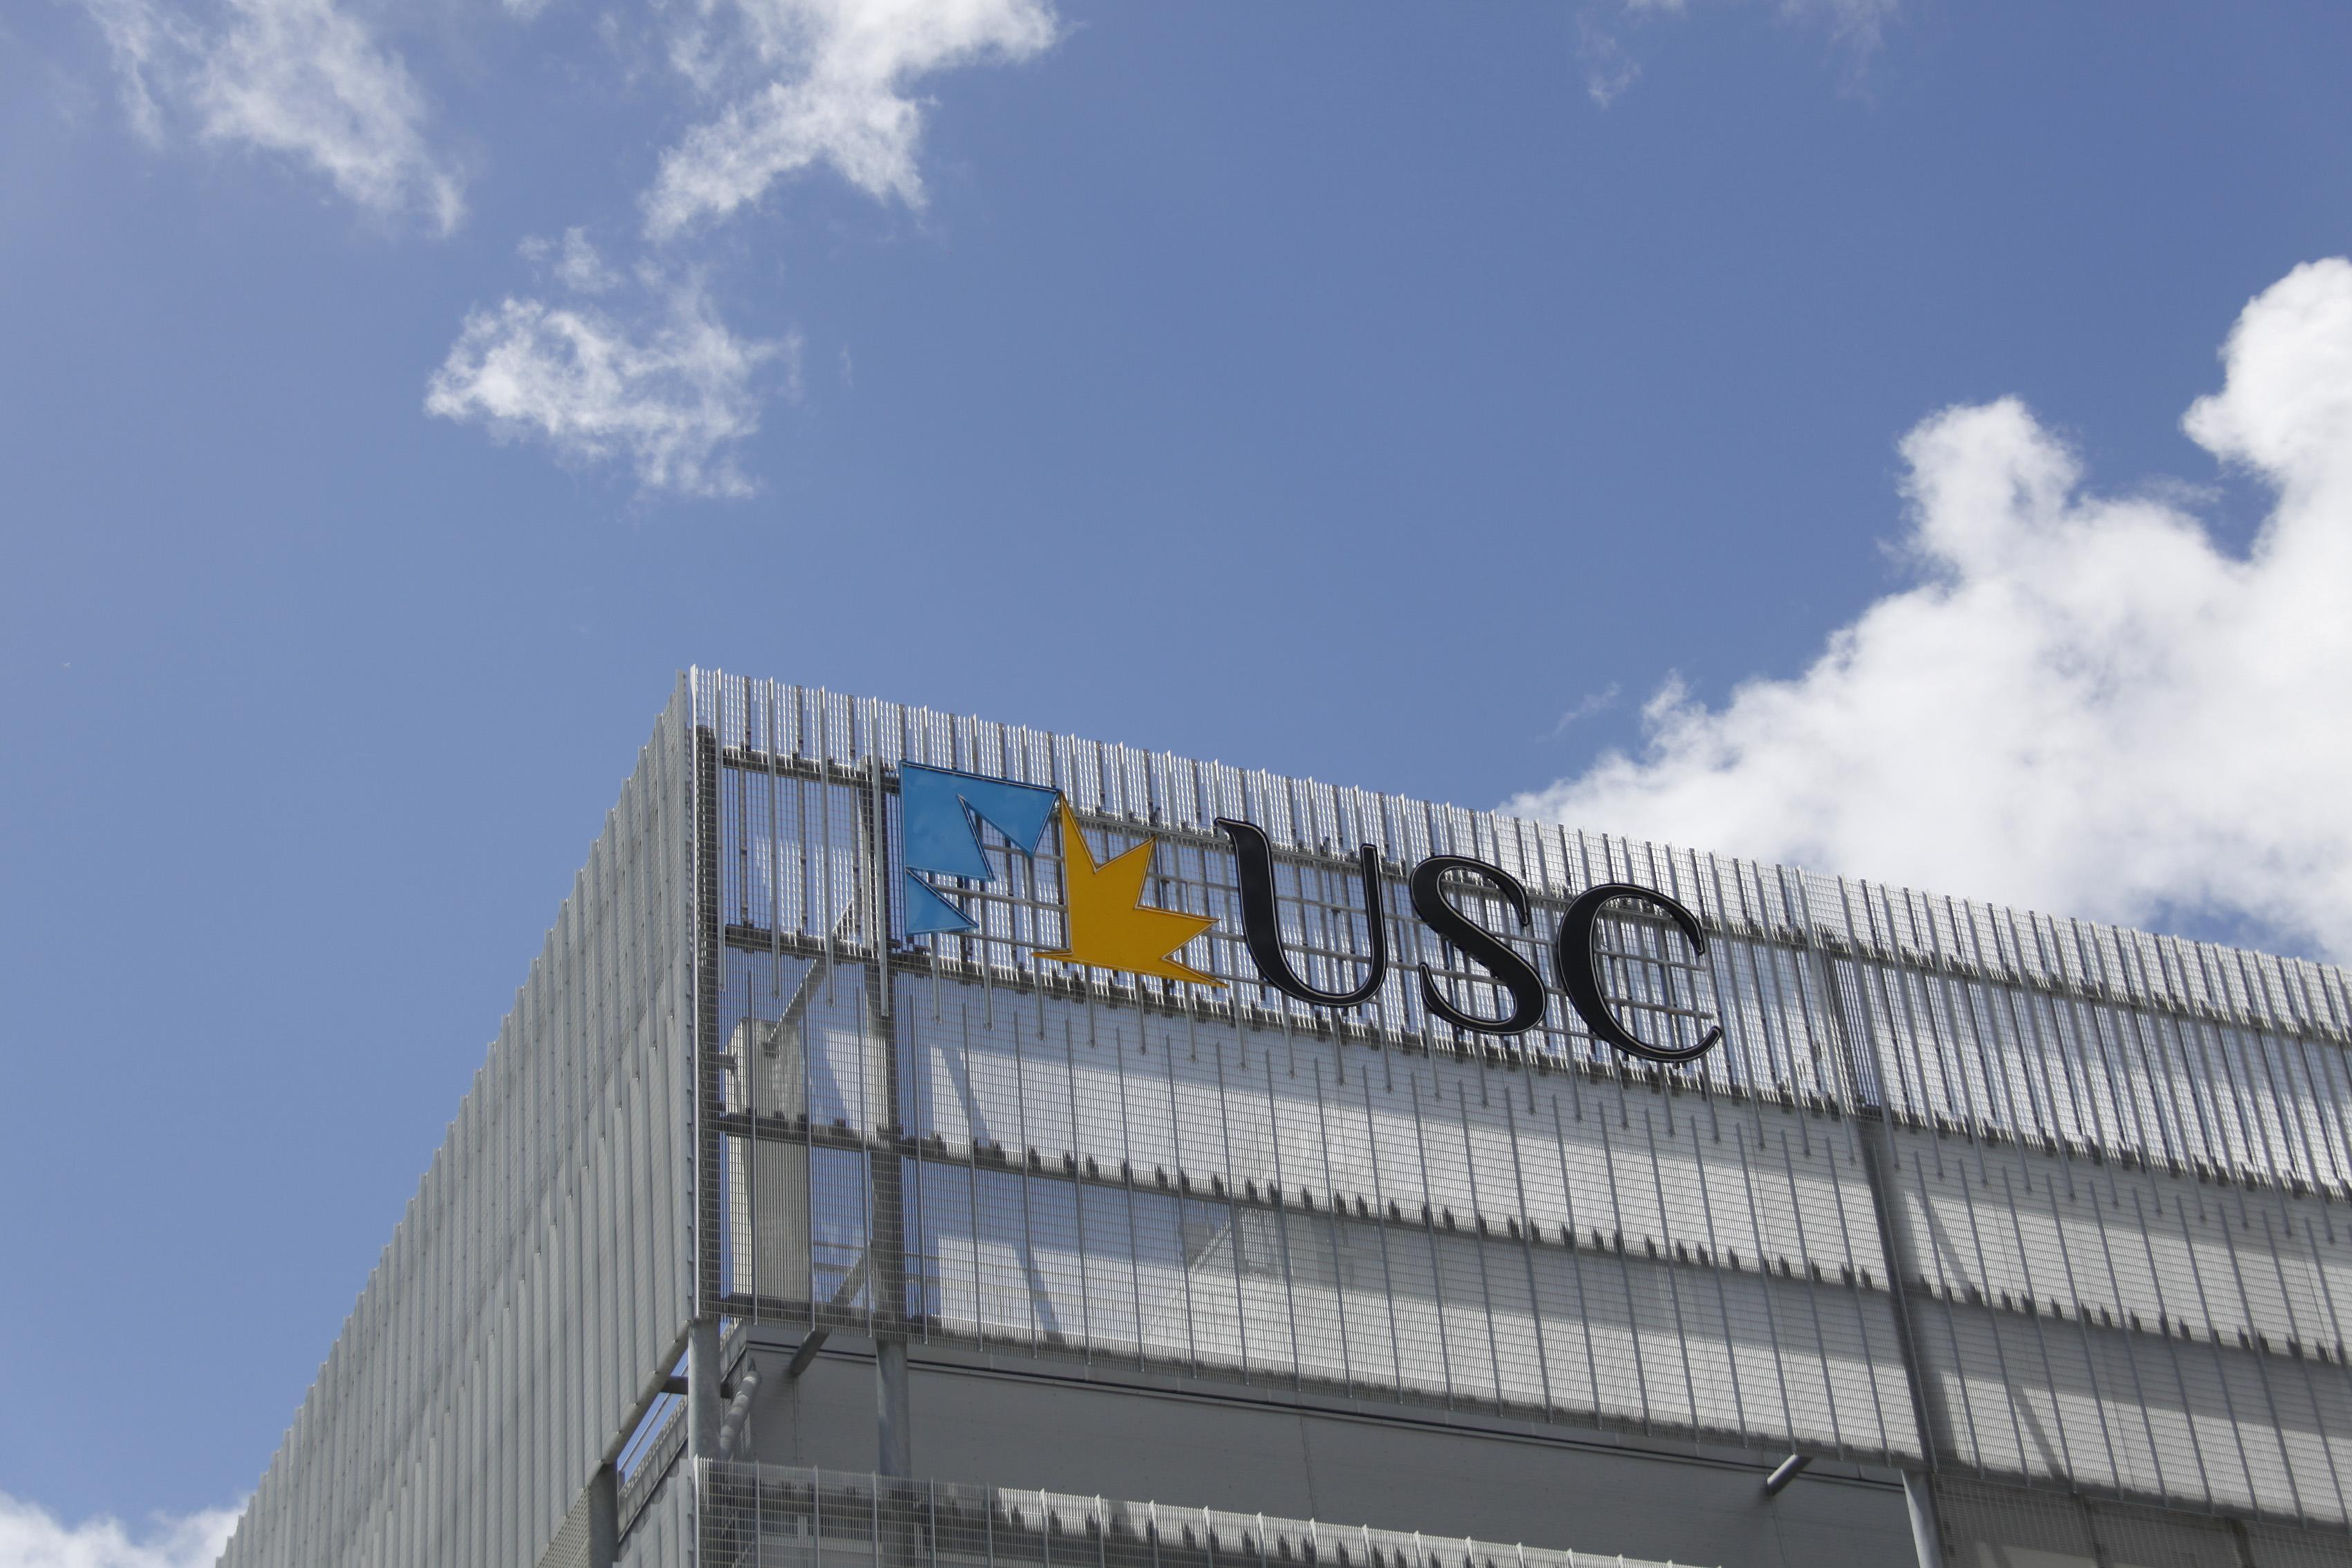 Usc Fall Semester 2020.Updates New Building K1 At Usc Sunshine Coast In 2020